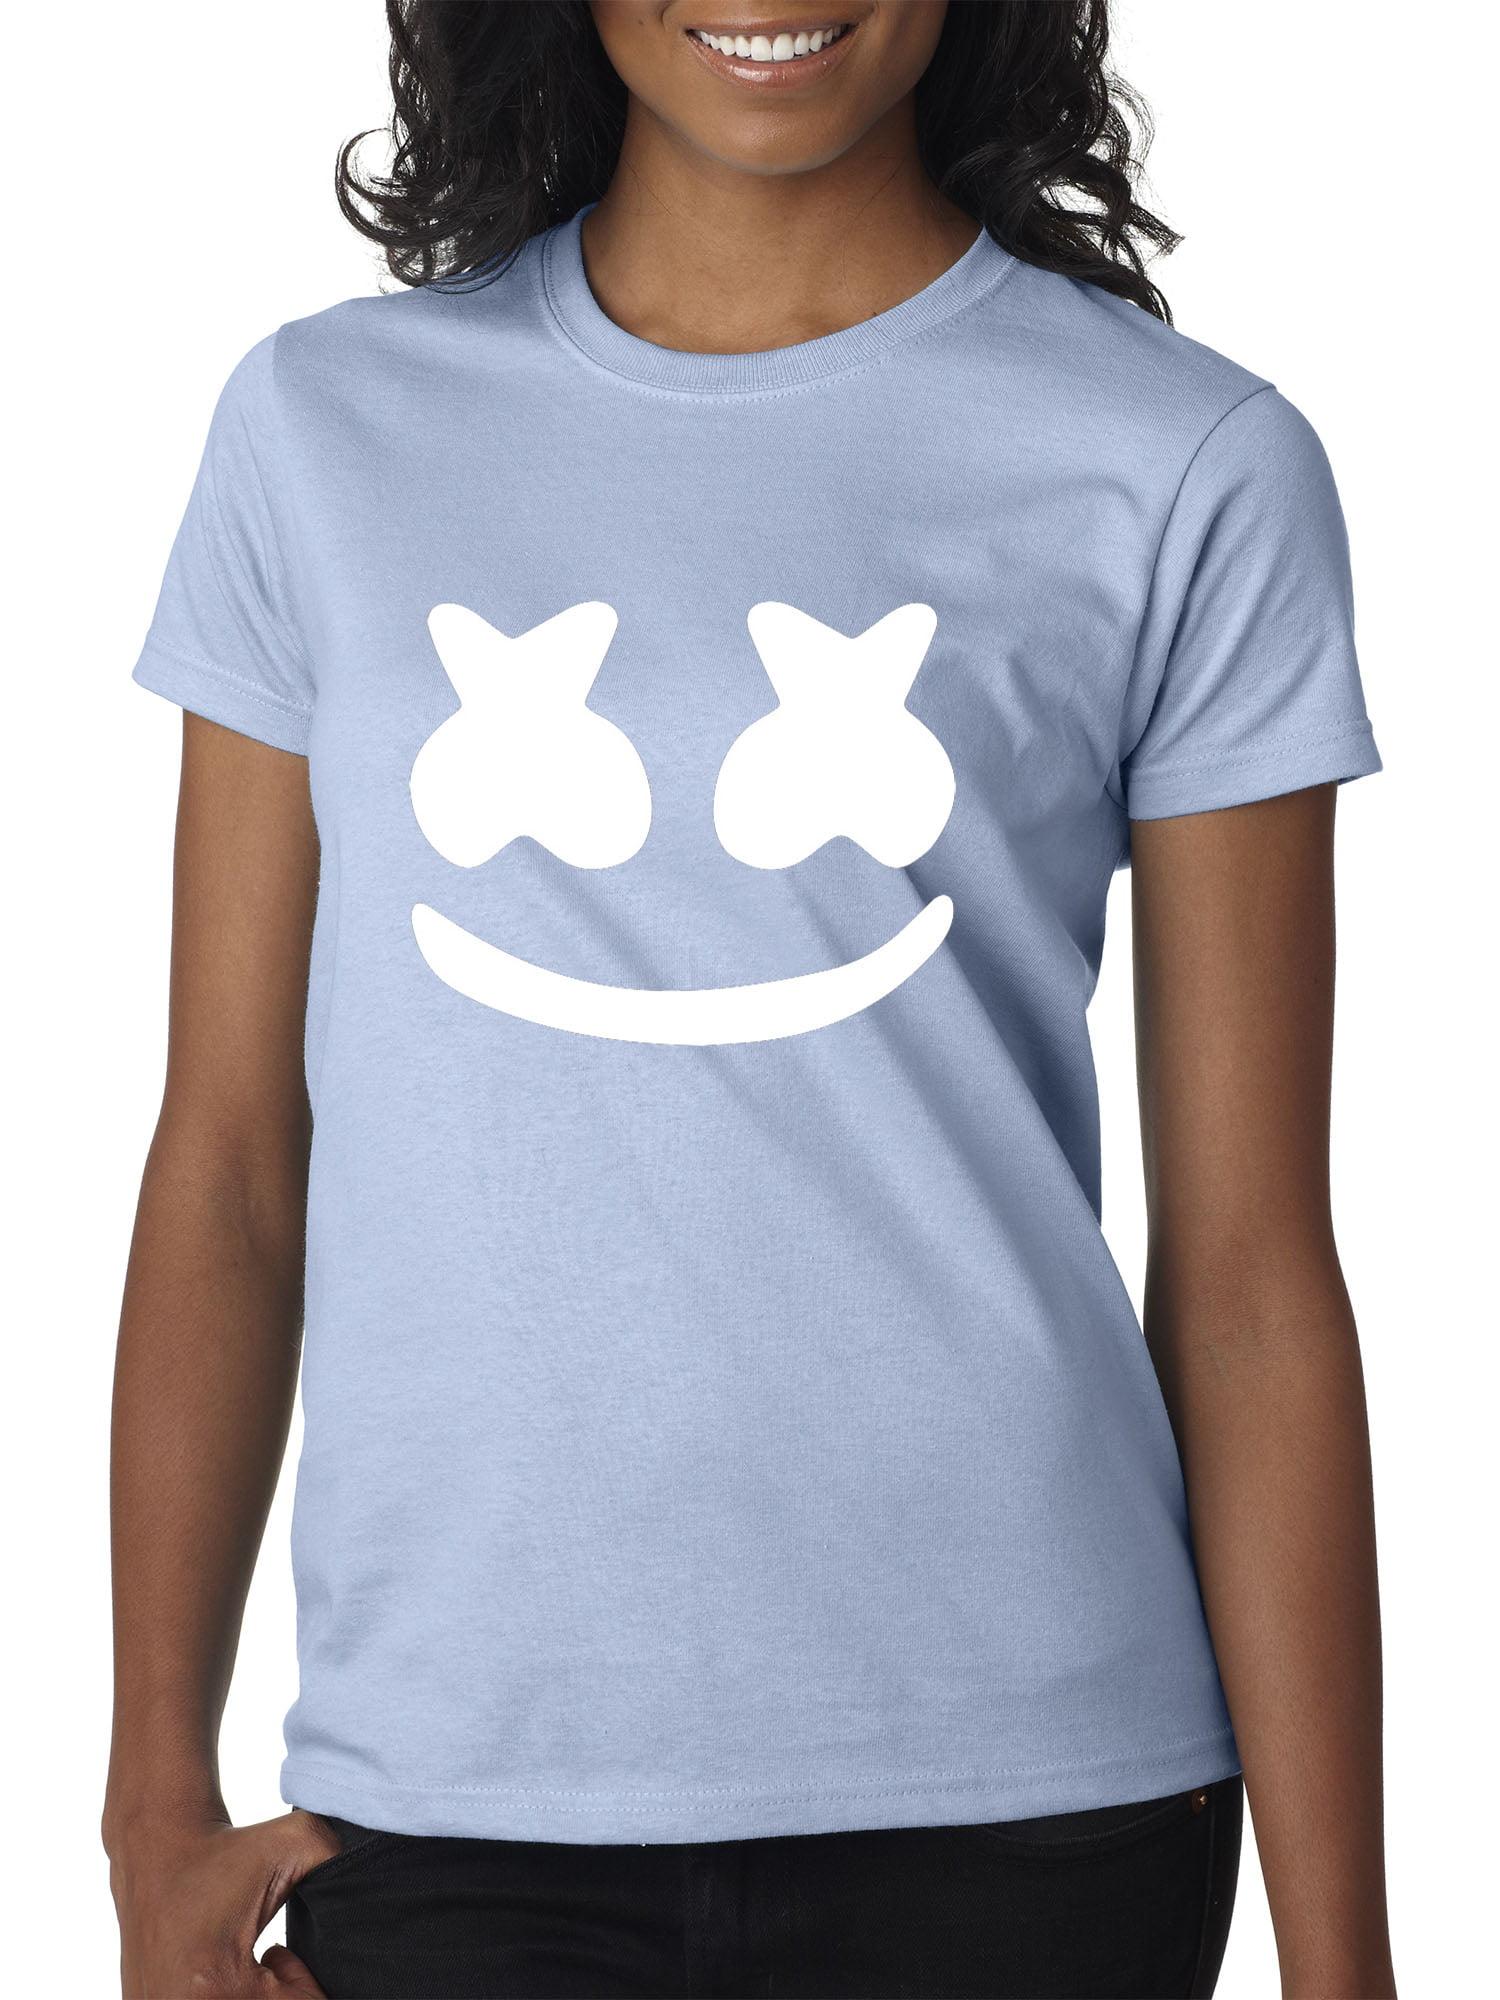 Youth T-Shirt Marshmello DJ Smiley Face New Way 984